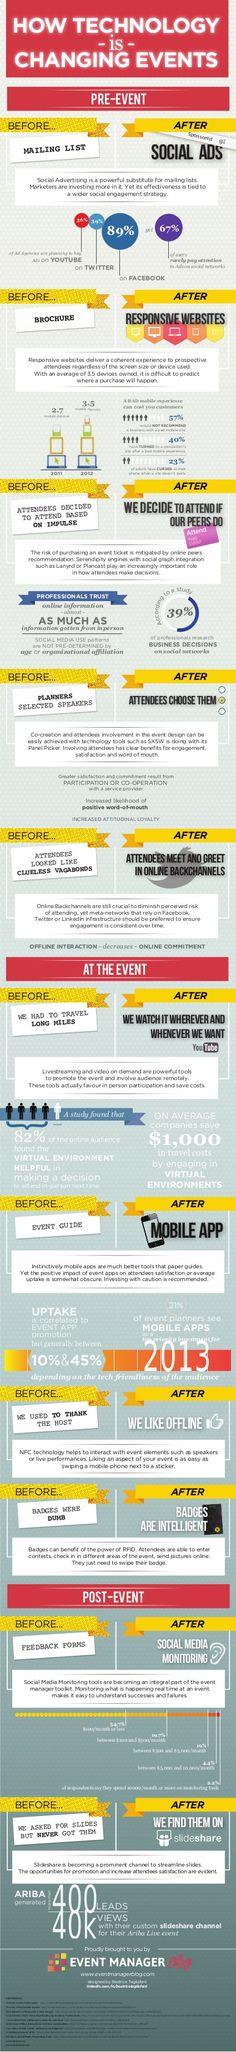 Event Technology Infographic by Julius Solaris, via Slideshare